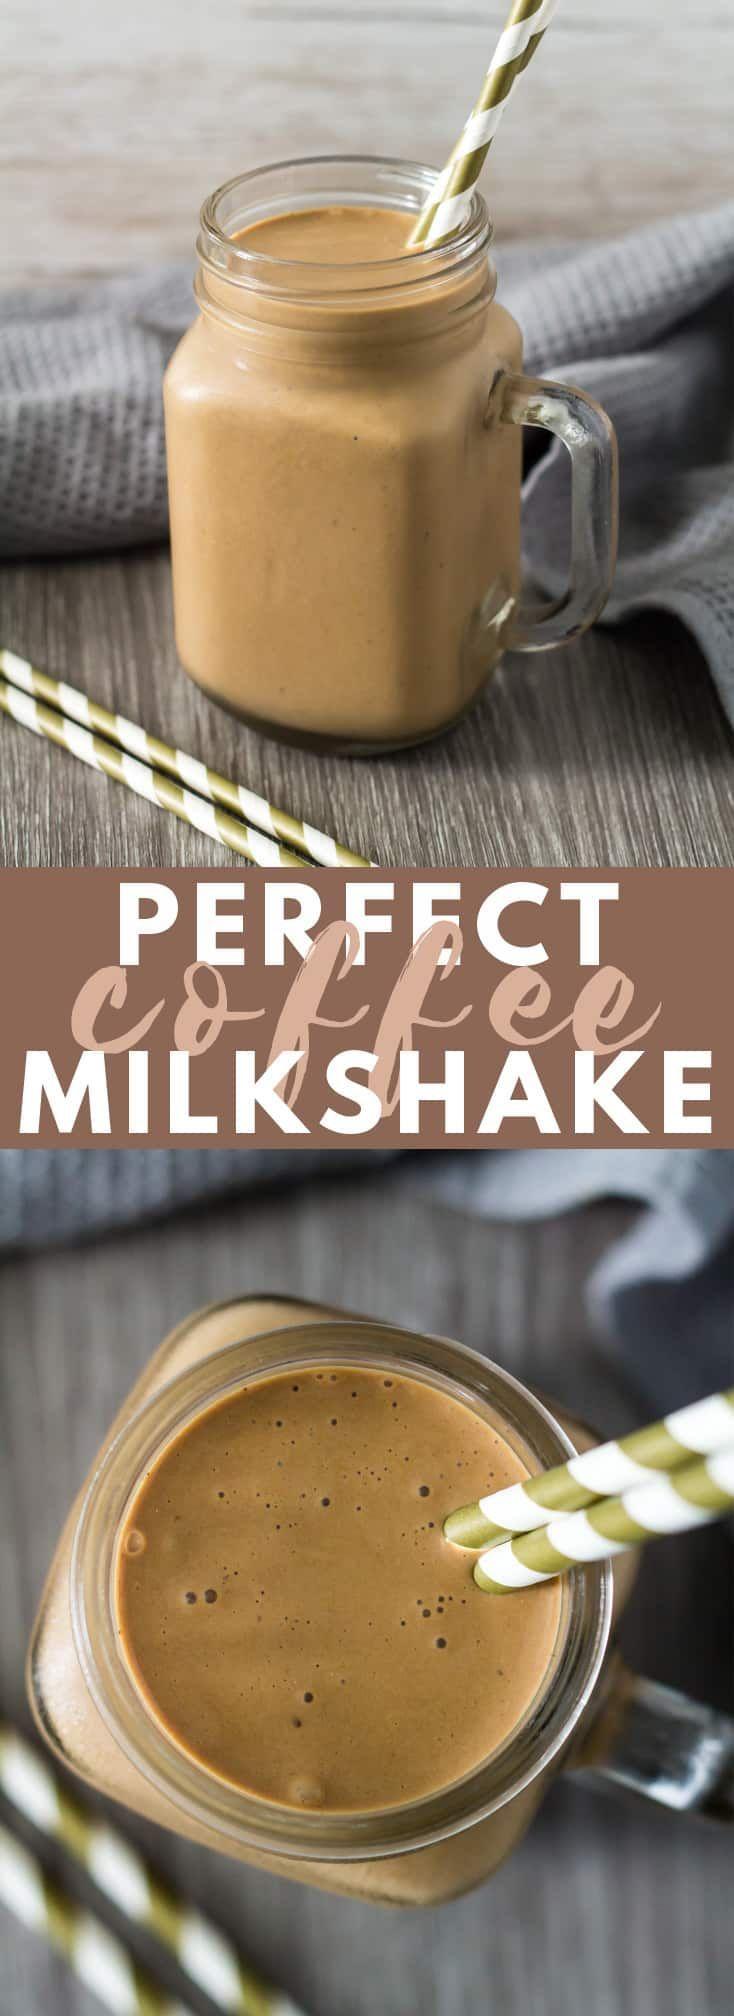 Photo of Perfect Coffee Milkshake